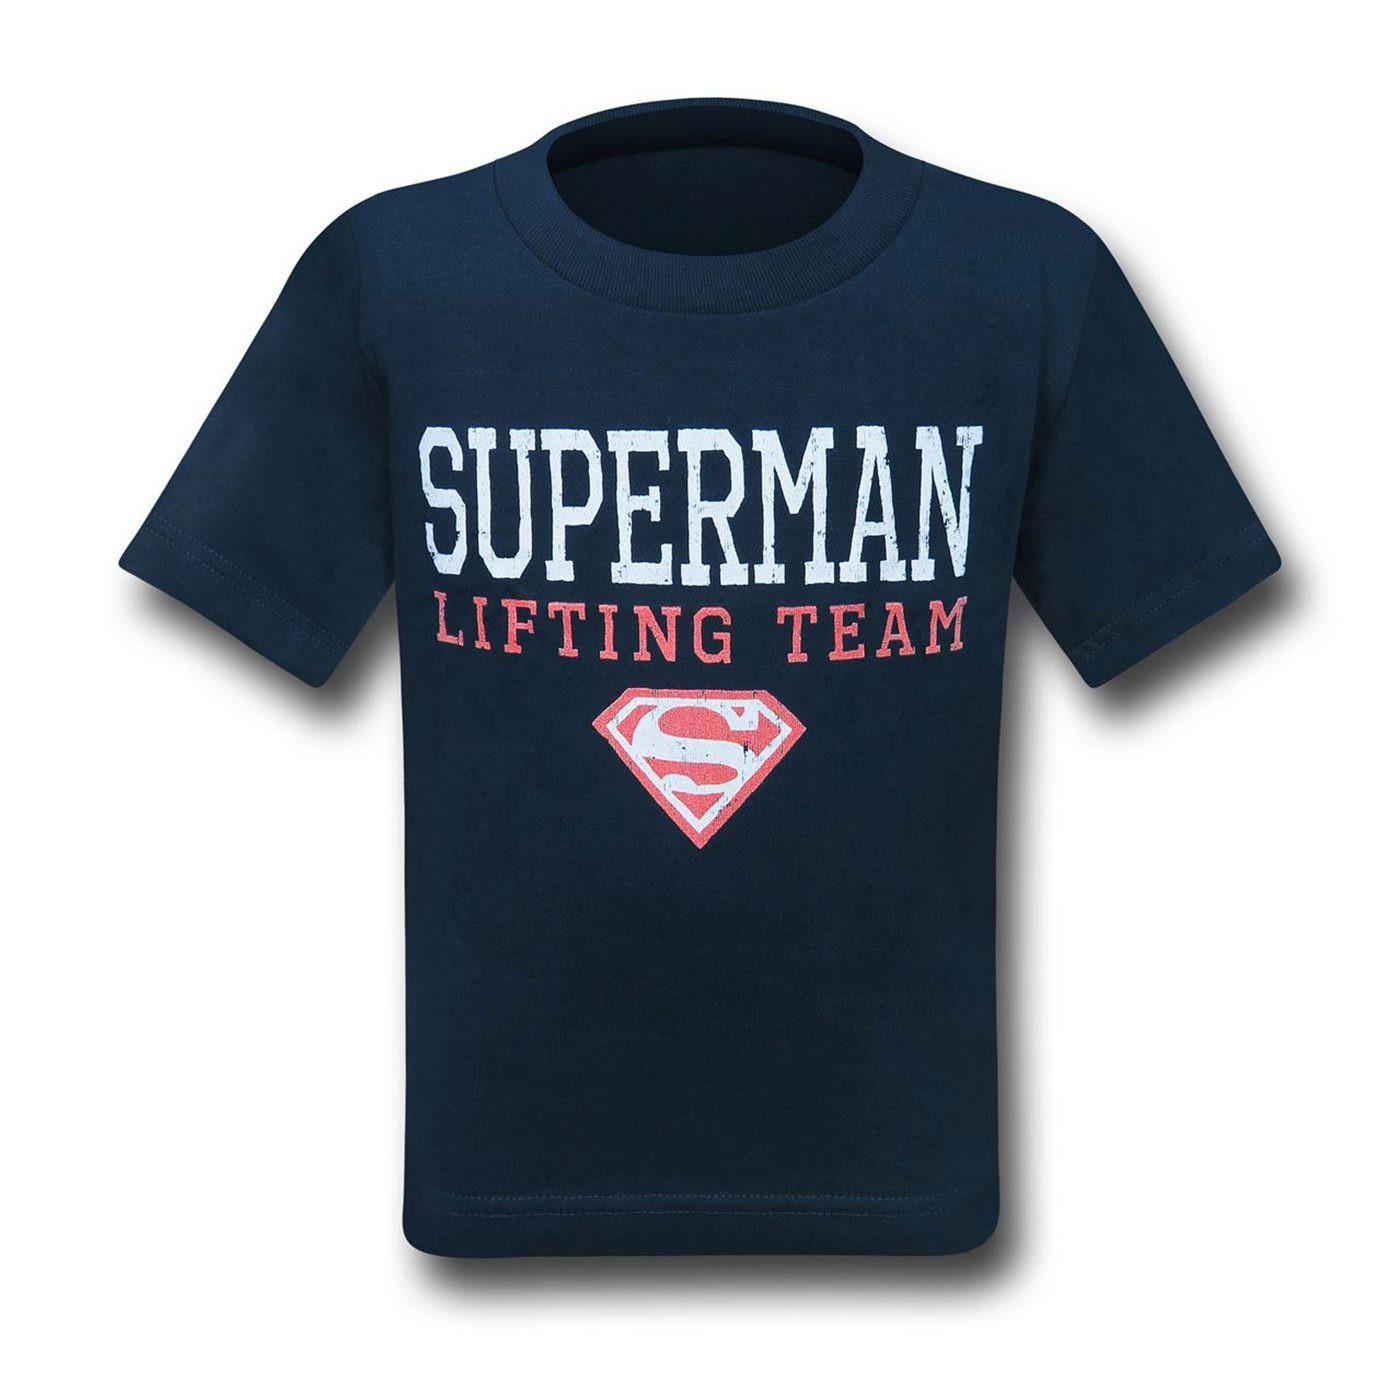 Superman Lifting Team Kids T-Shirts